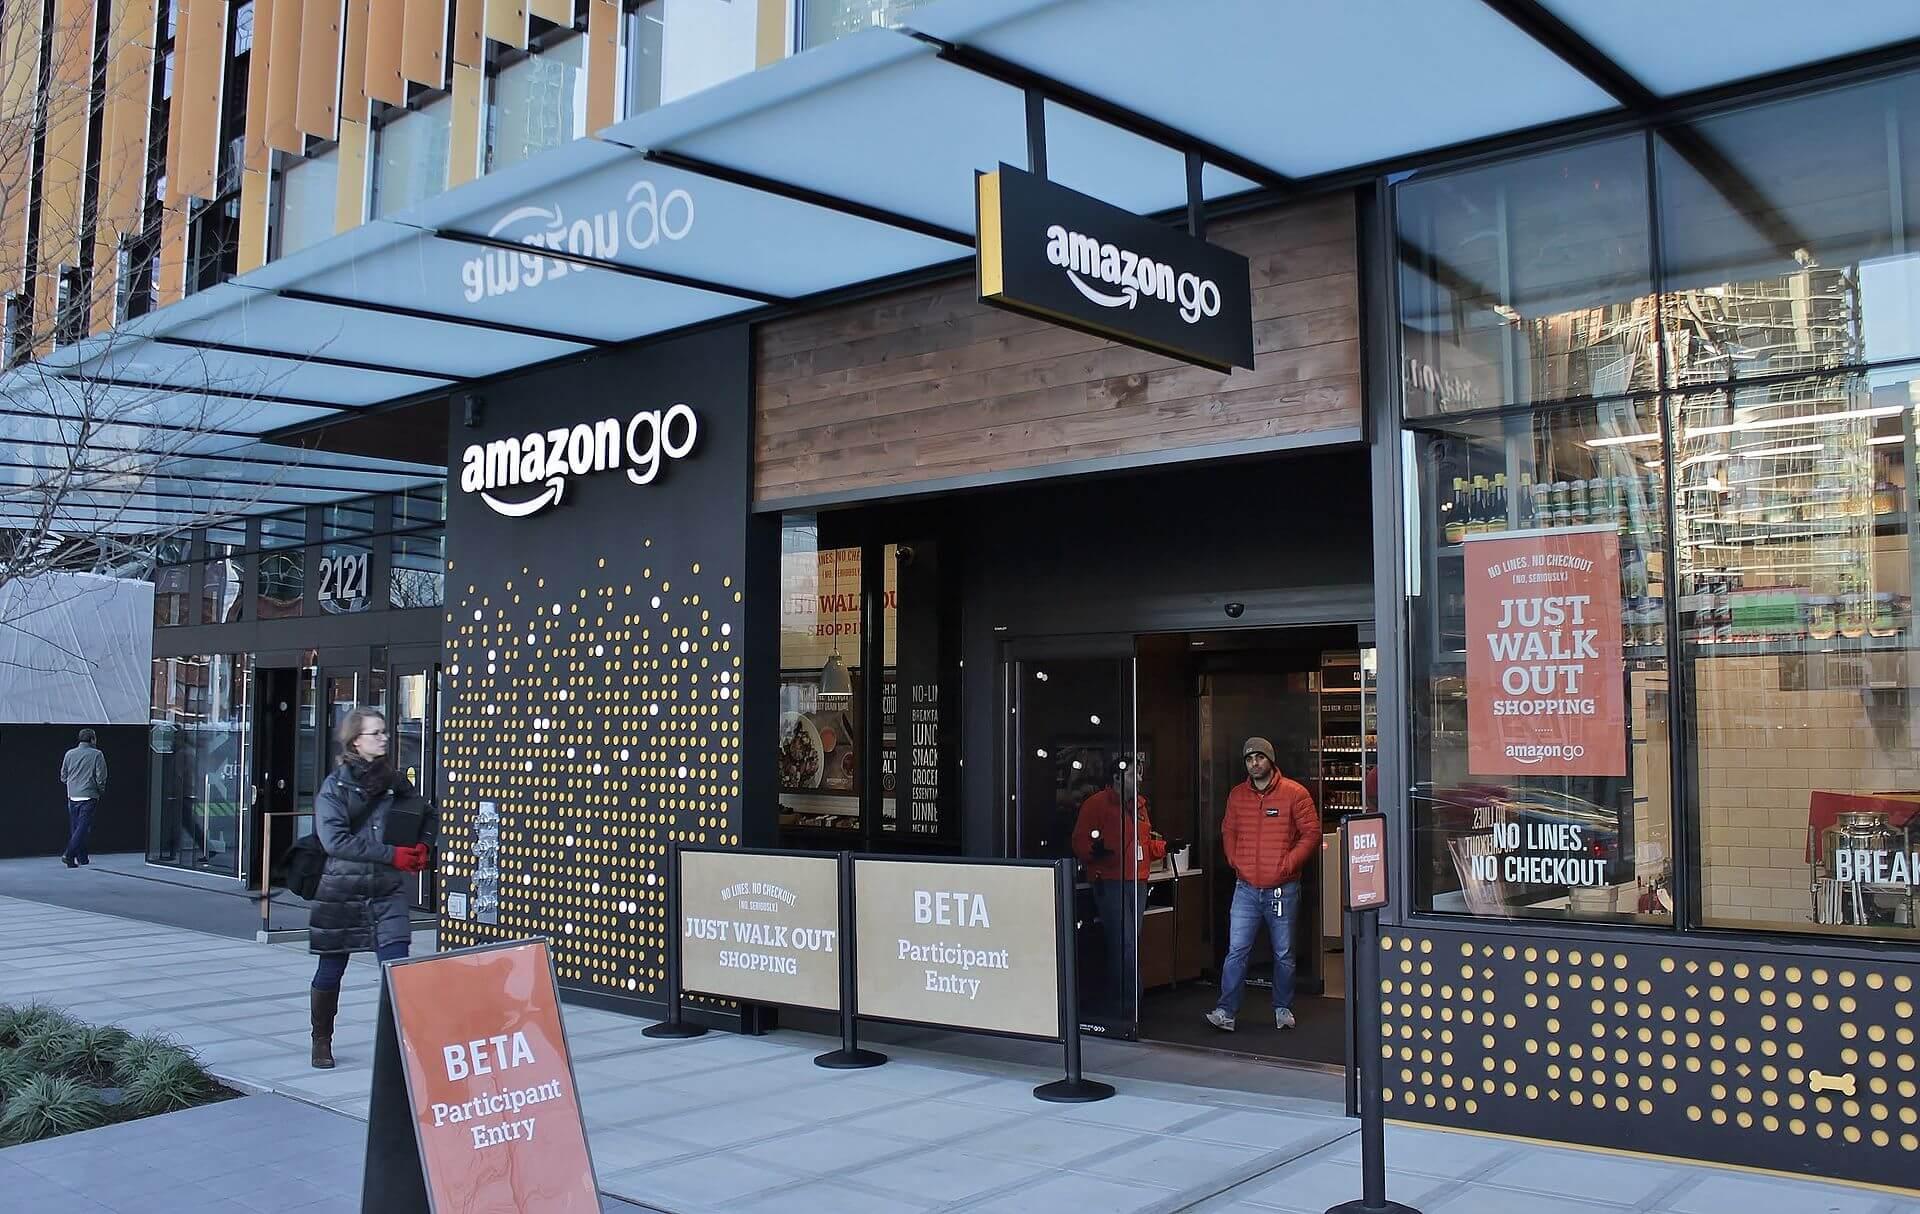 AmazonGo service experience